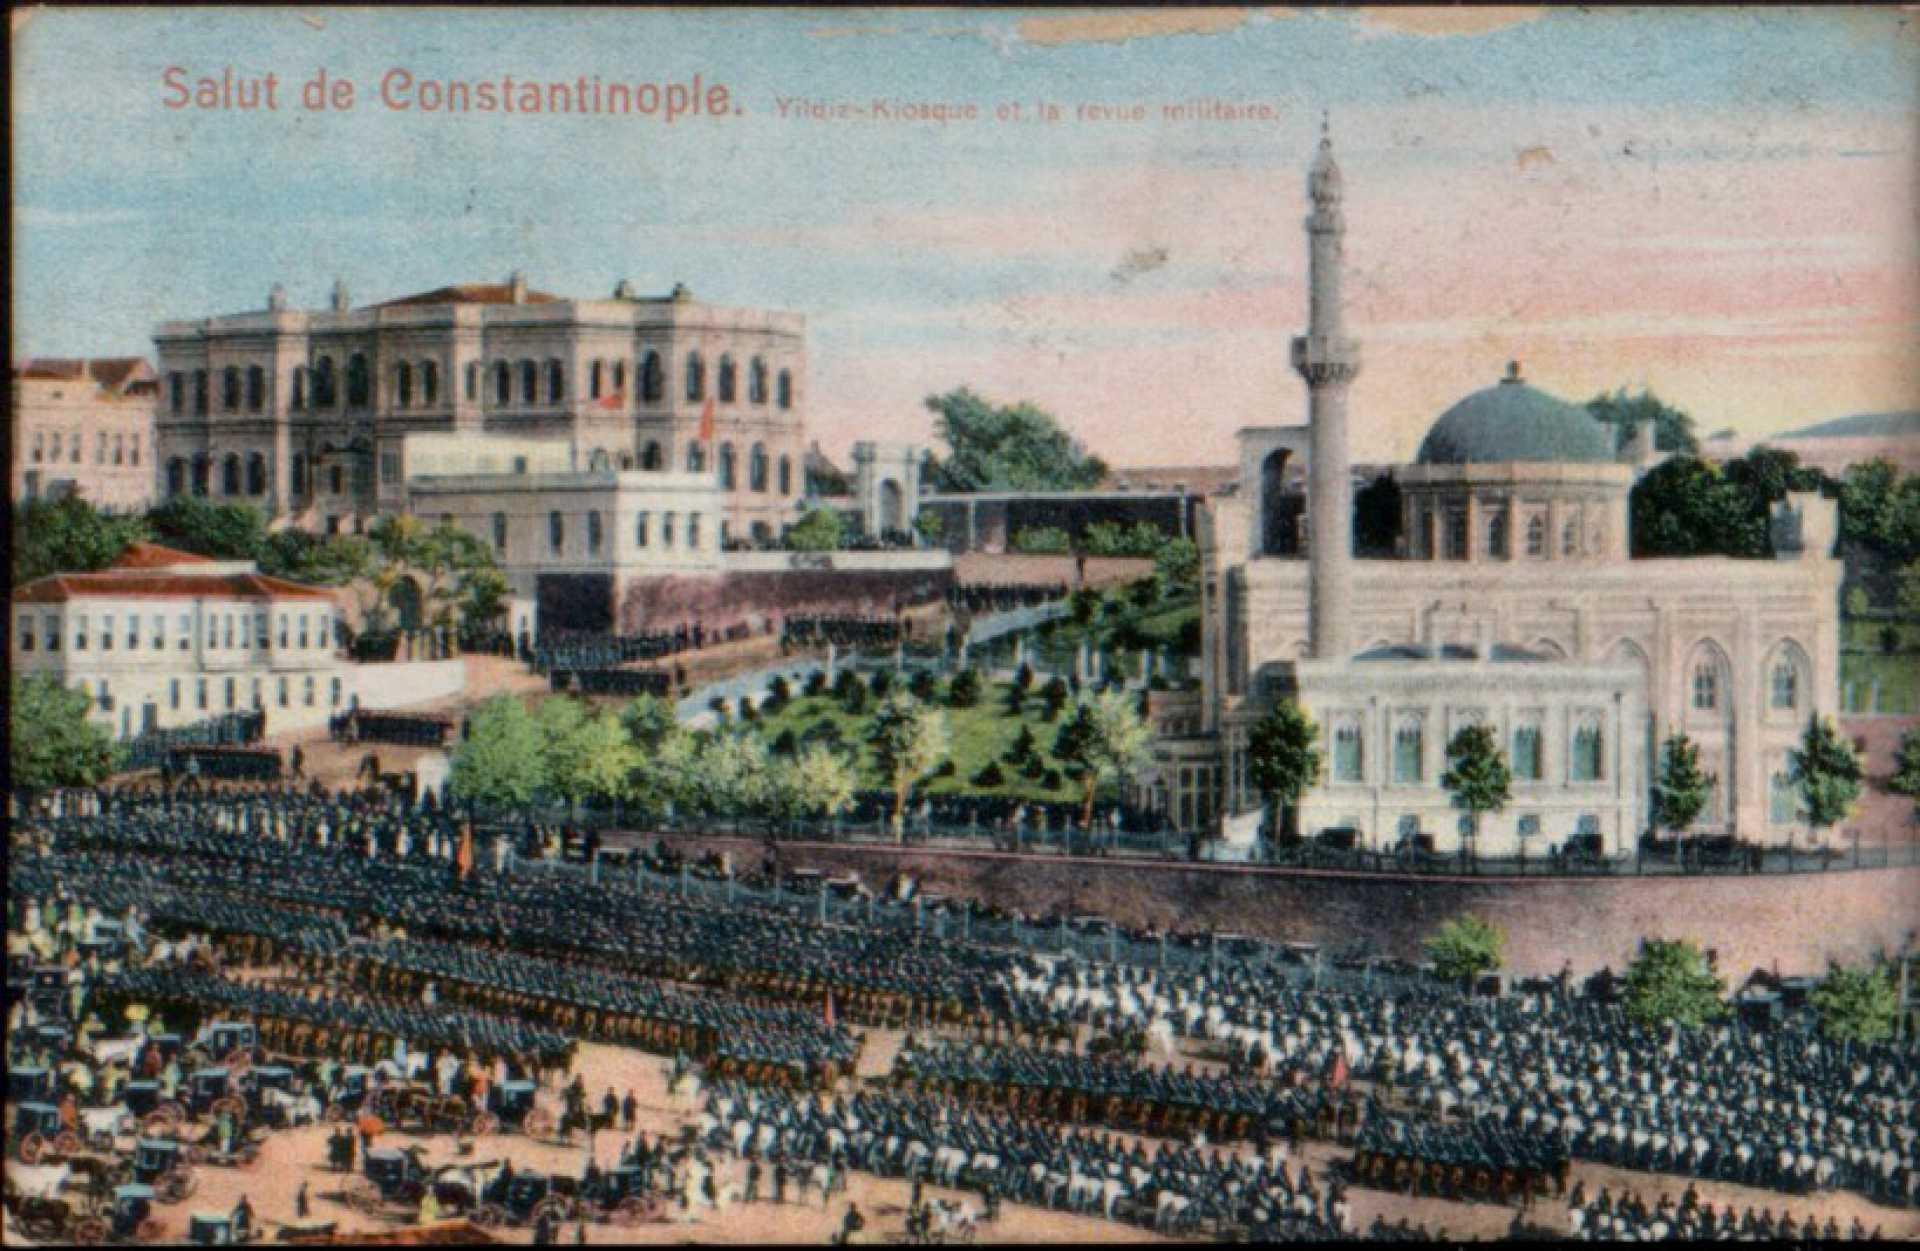 Yildiz-Kiosque et la revue militare